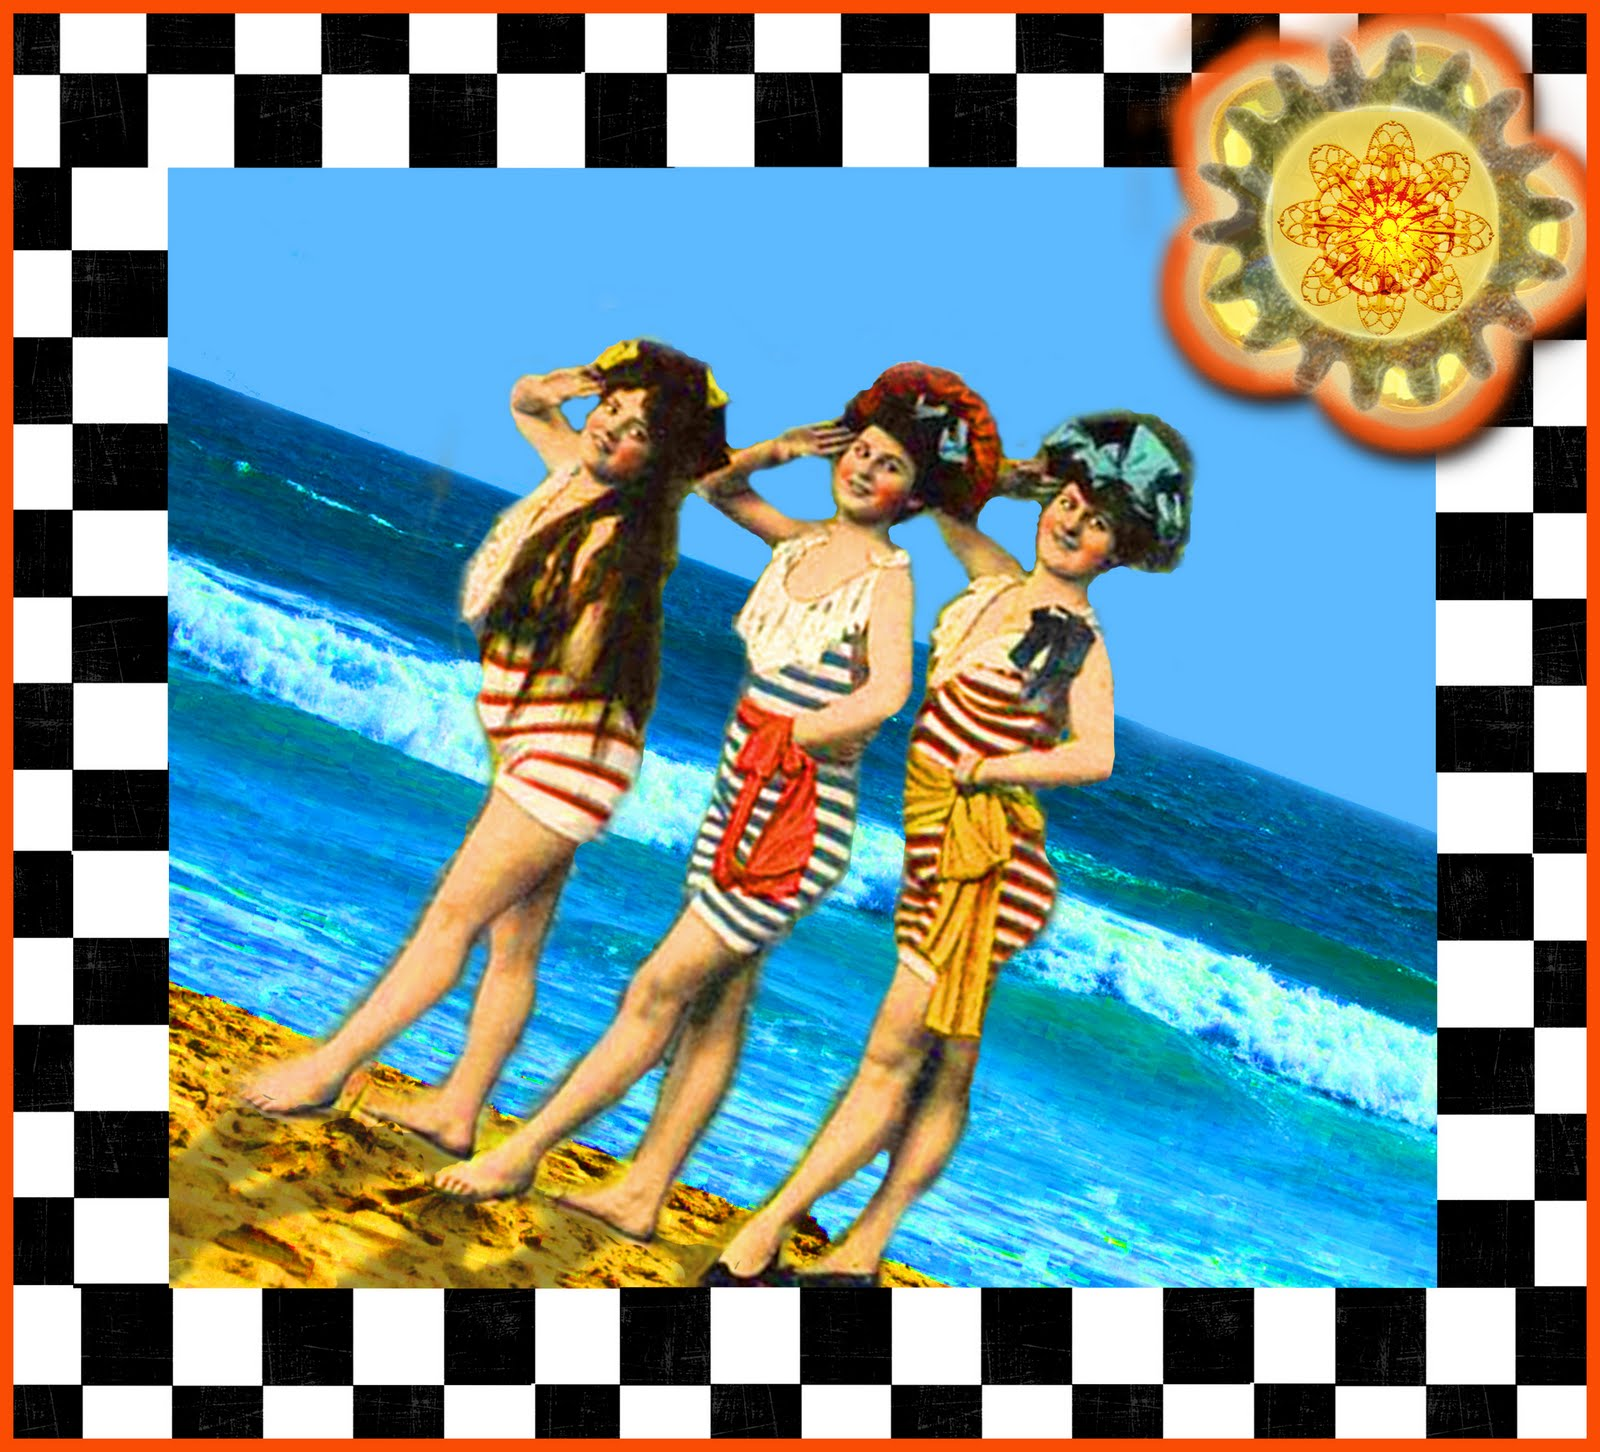 http://1.bp.blogspot.com/-9qeqy_PgBv4/Tf9FFXIRRfI/AAAAAAAABcE/R-Gfeh9igKw/s1600/Beach%252BBabes%252Bcopy.jpg